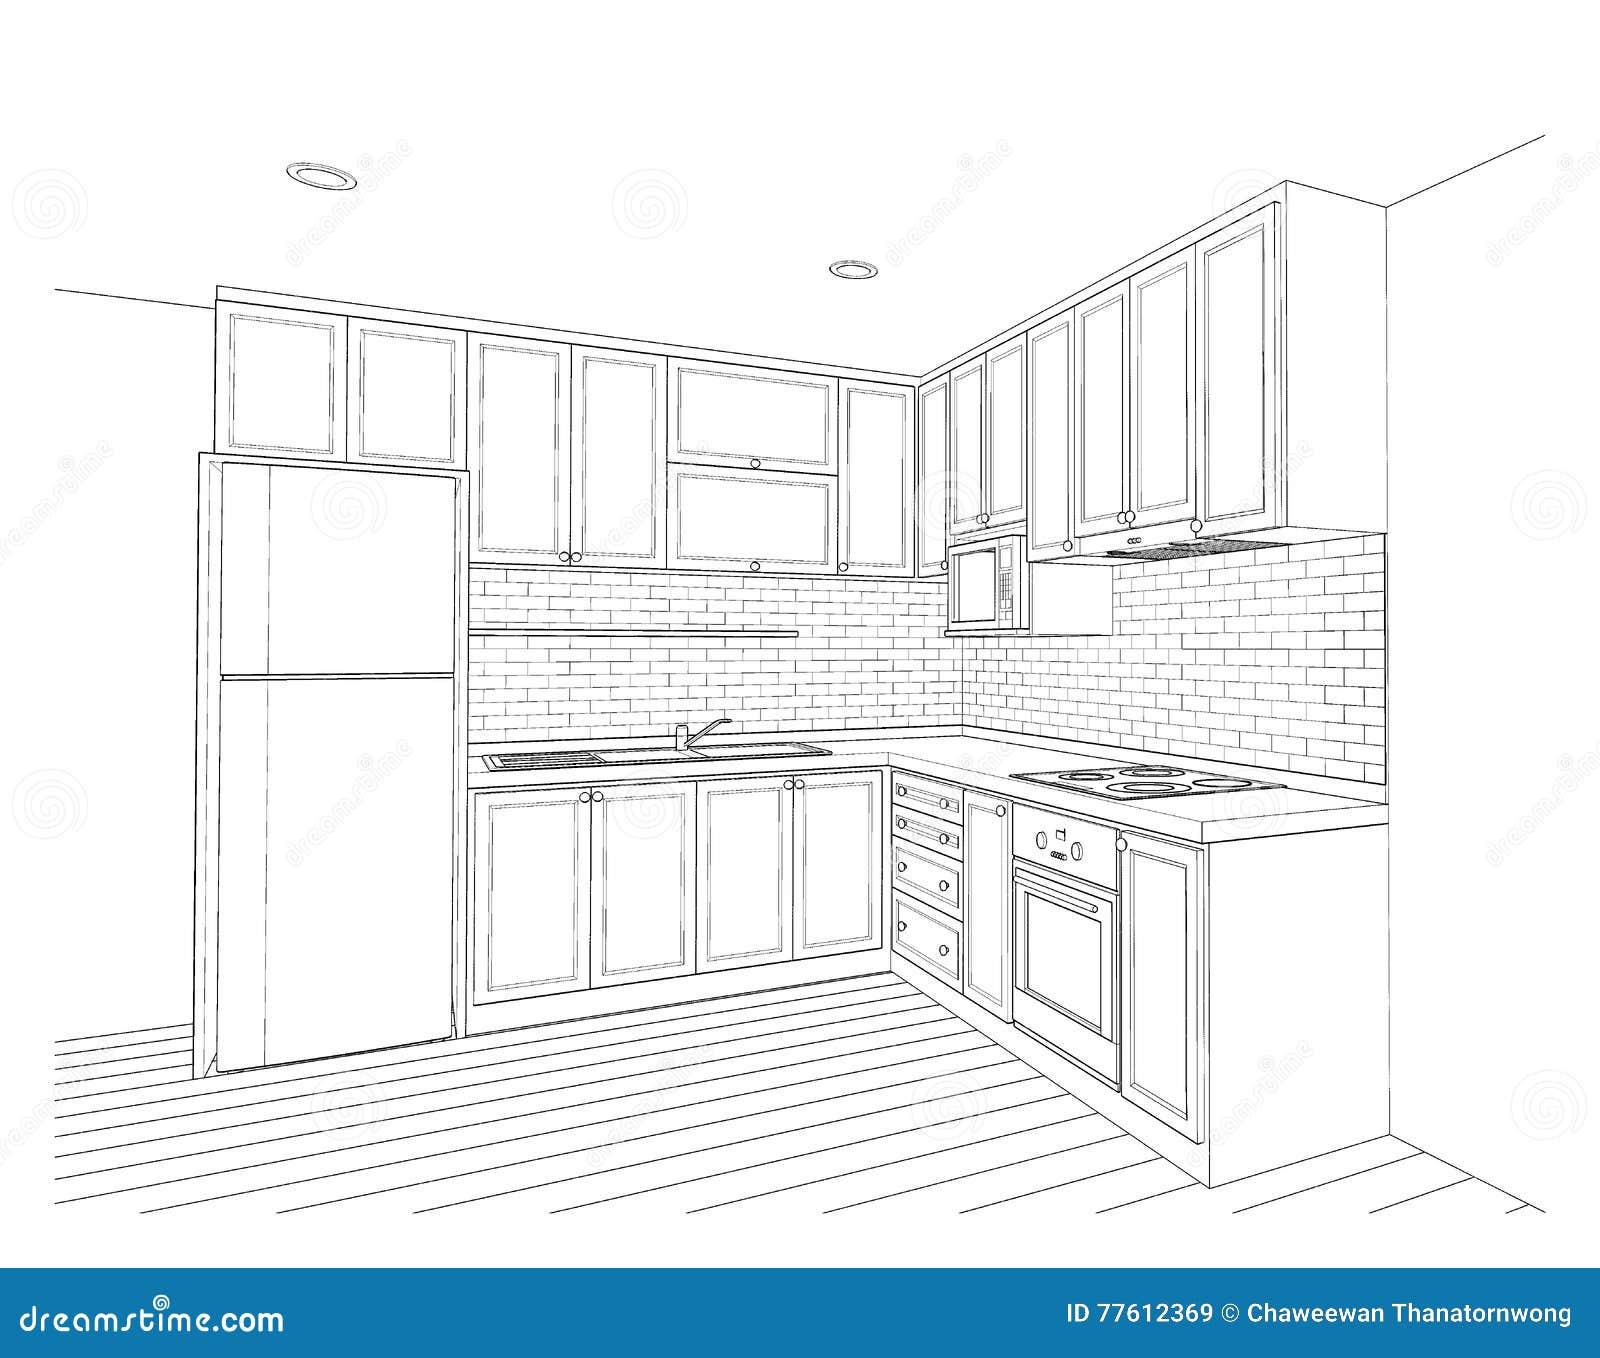 Dream Kitchen Design Drawing: Ů�内设计,厨房 ź�存例证. Ə�画 Ō�括有 Ɯ�柜, ǎ�有量, Ļ�何地方, ǃ�箱, Ʀ�念, ś�家(地区), Ǽ�译